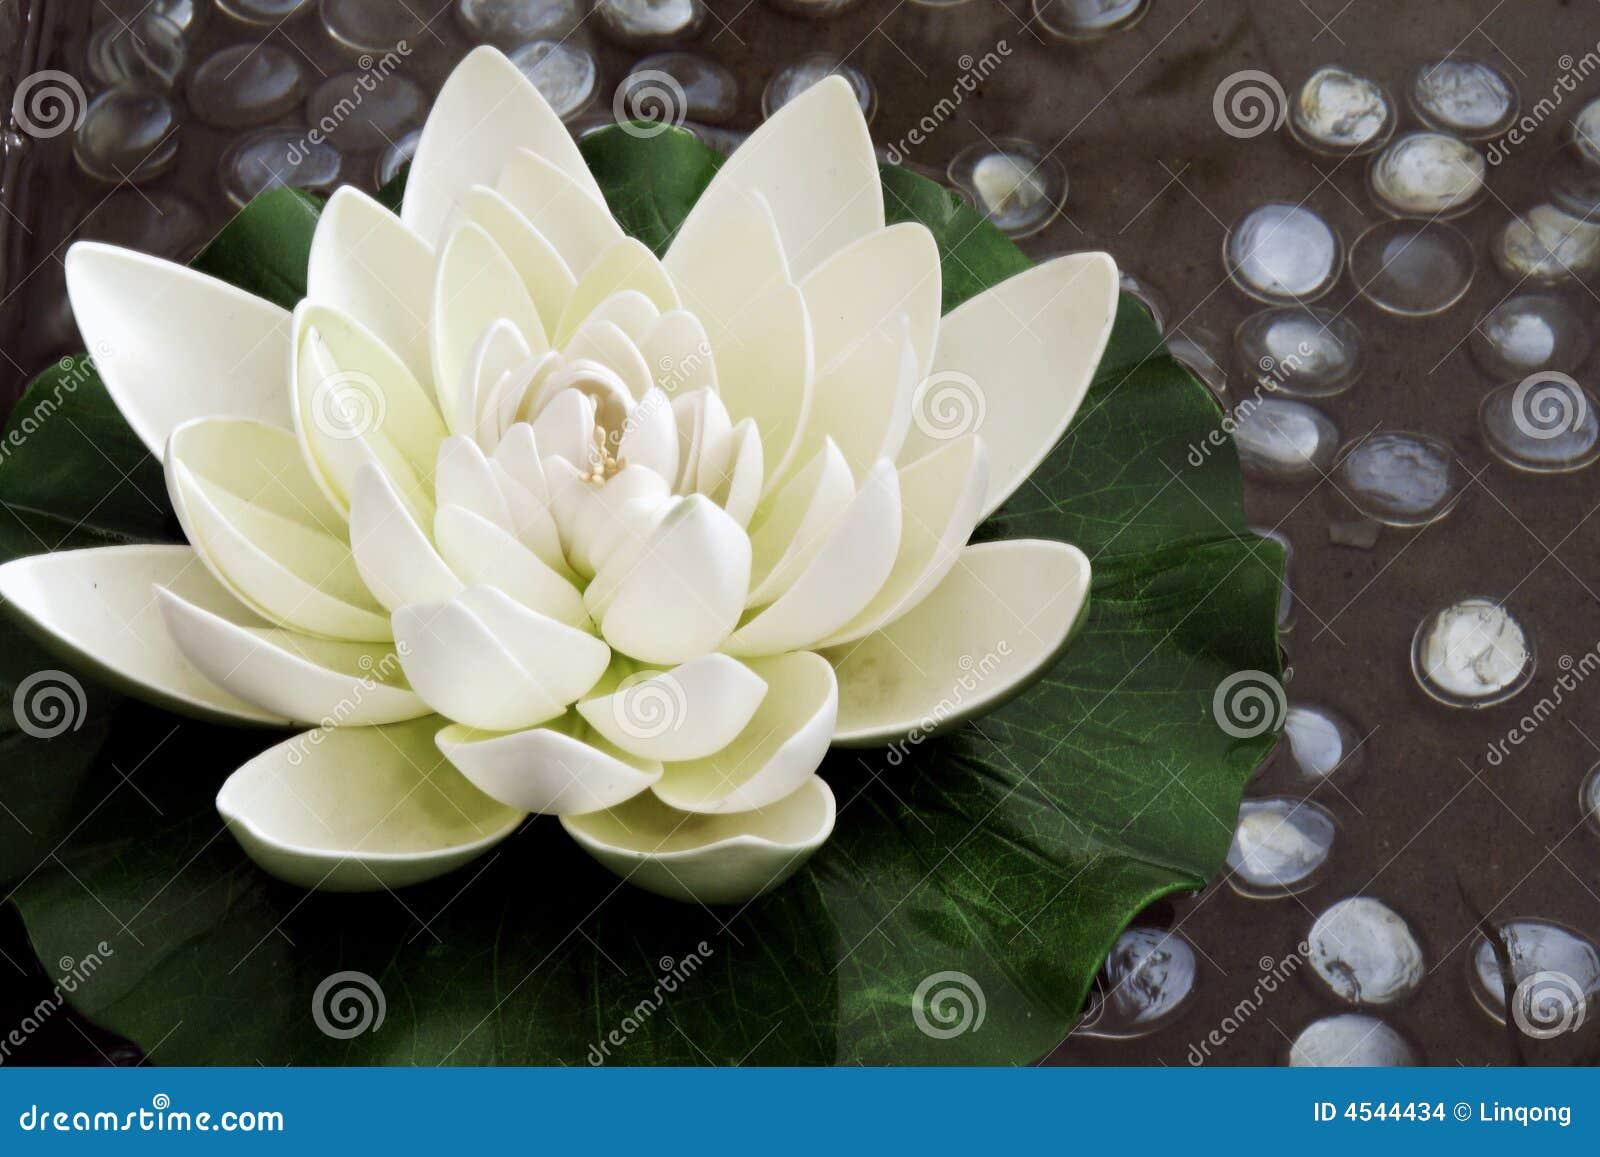 La fleur de lotus artificielle